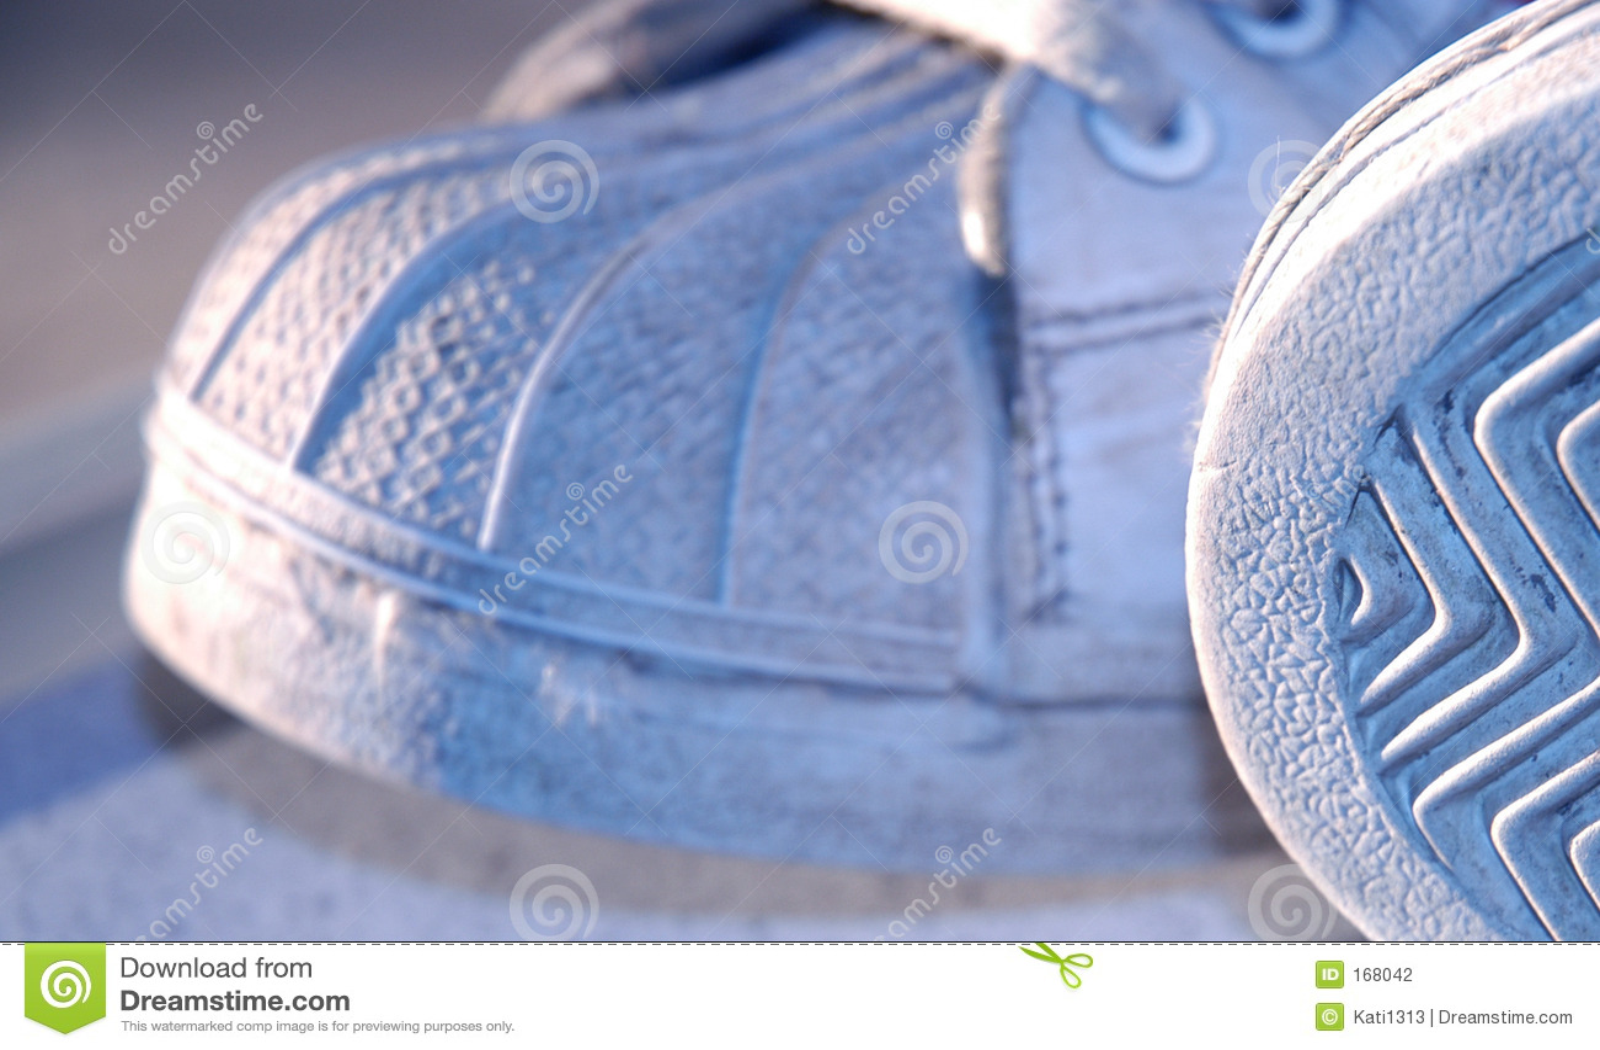 Shoes II